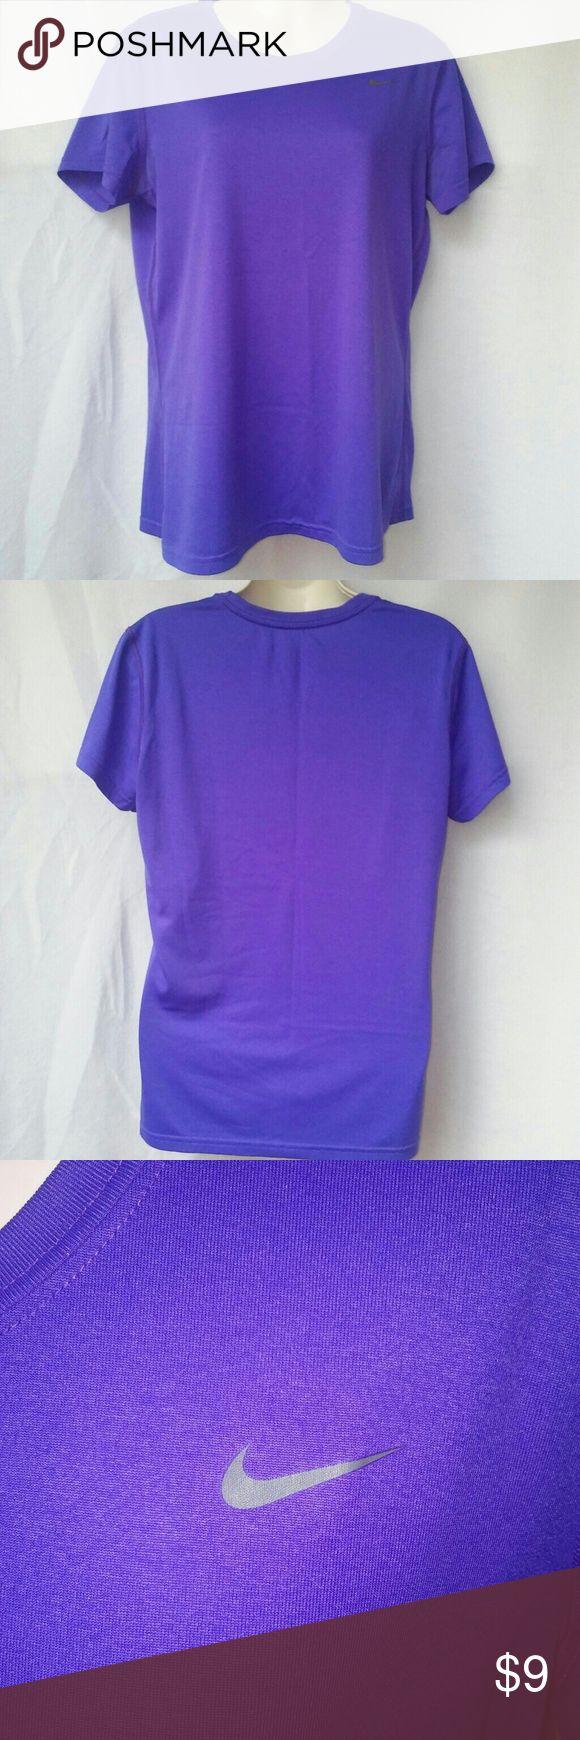 Nike Dri Fit Shirt Sz L Regular Fit Nike Dri Fit Shirt Sz L Regular Fit. Gently used in great condition, no snags or holes. (lighting is off in pics, the shirt is purple). Nike Tops Tees - Short Sleeve